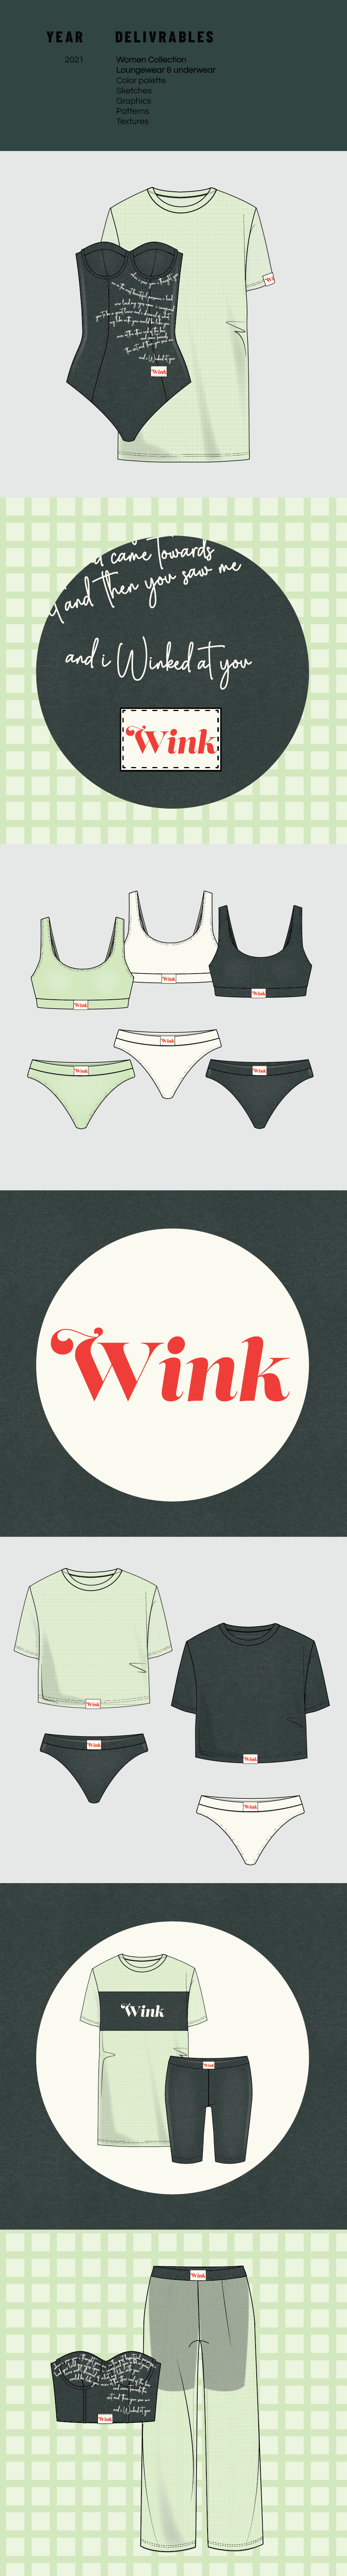 WINK-01.png